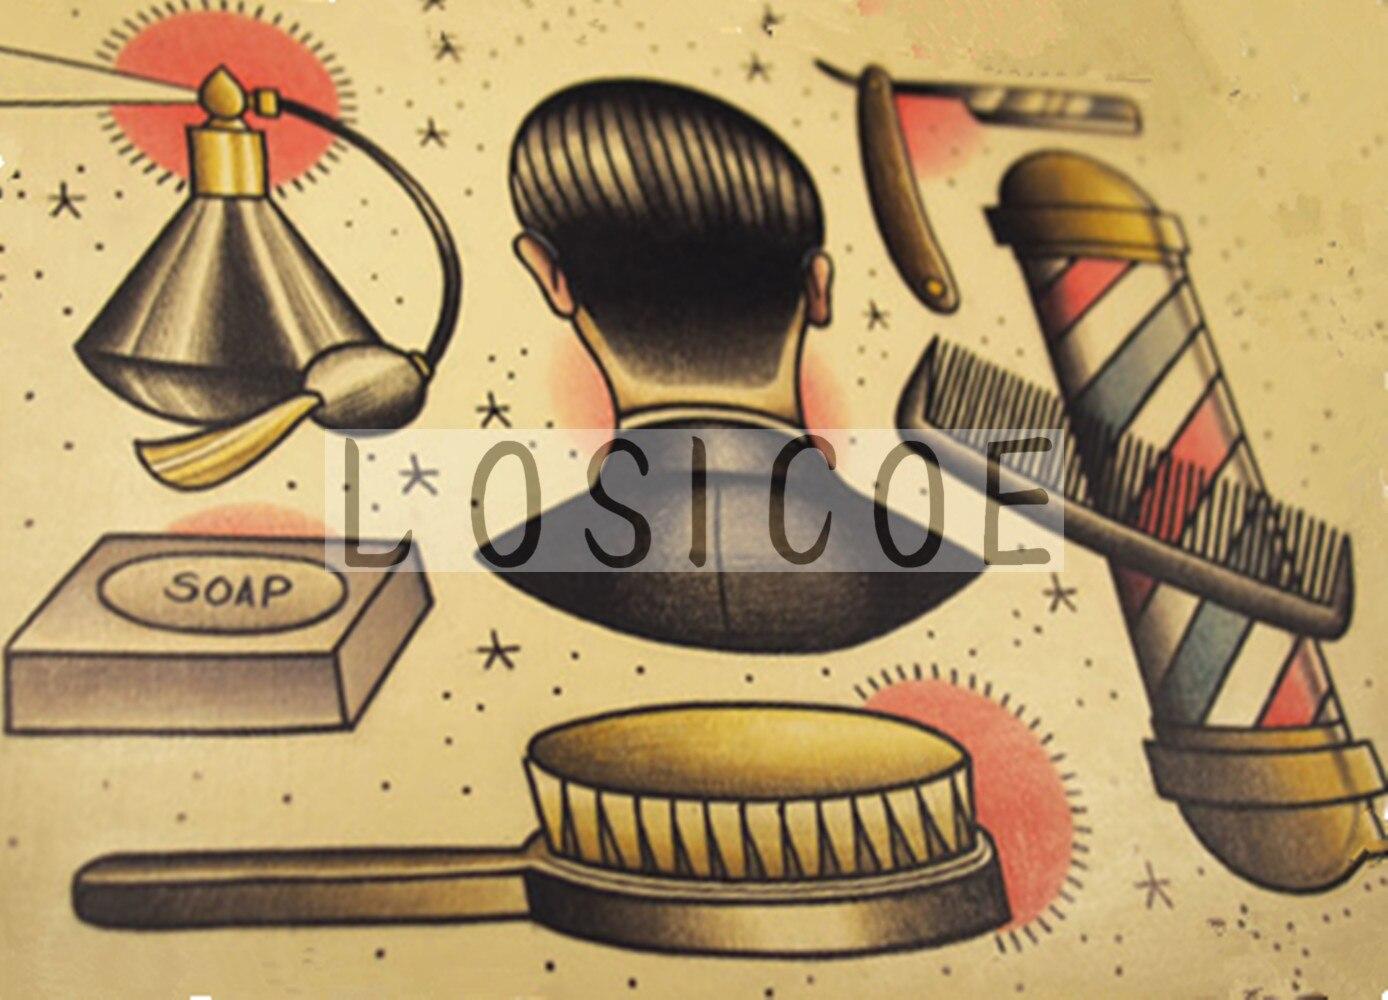 Hairdresser vintage tattoos pattern kraft paper poster wall sticker art print painting Hair salon barber shop decor 30X42 CM